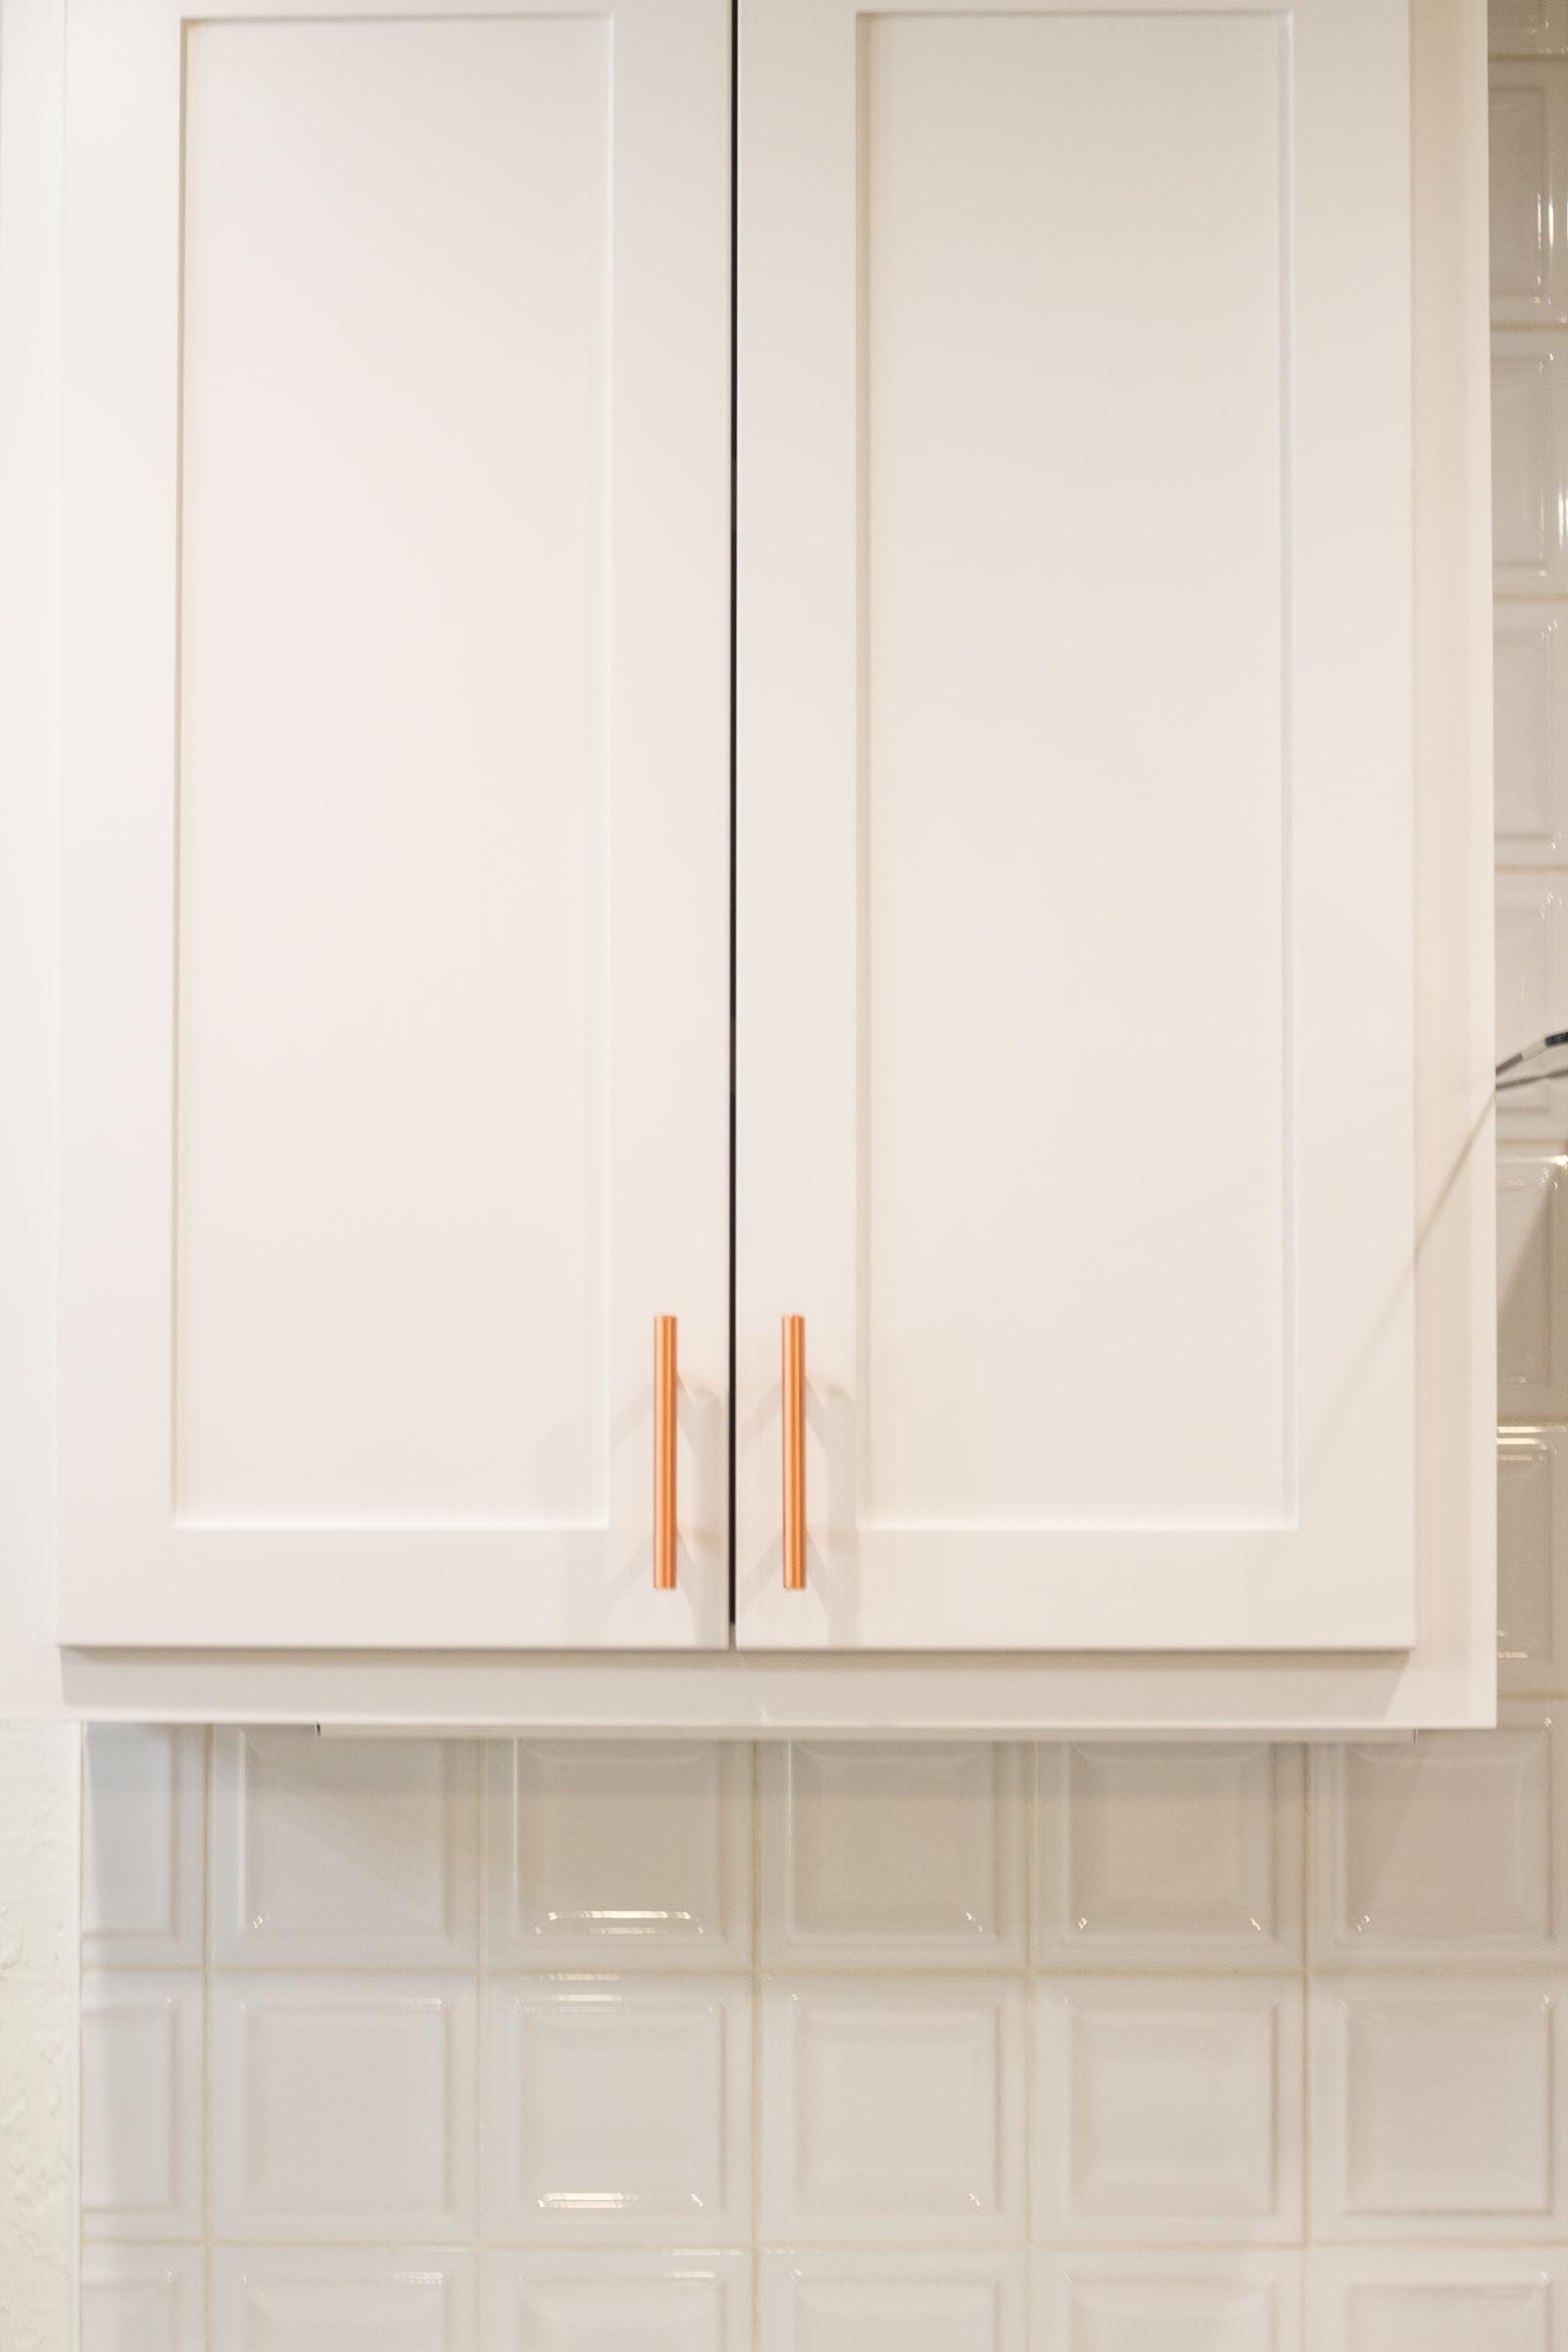 White shaker cabinets and backsplash with copper hardware